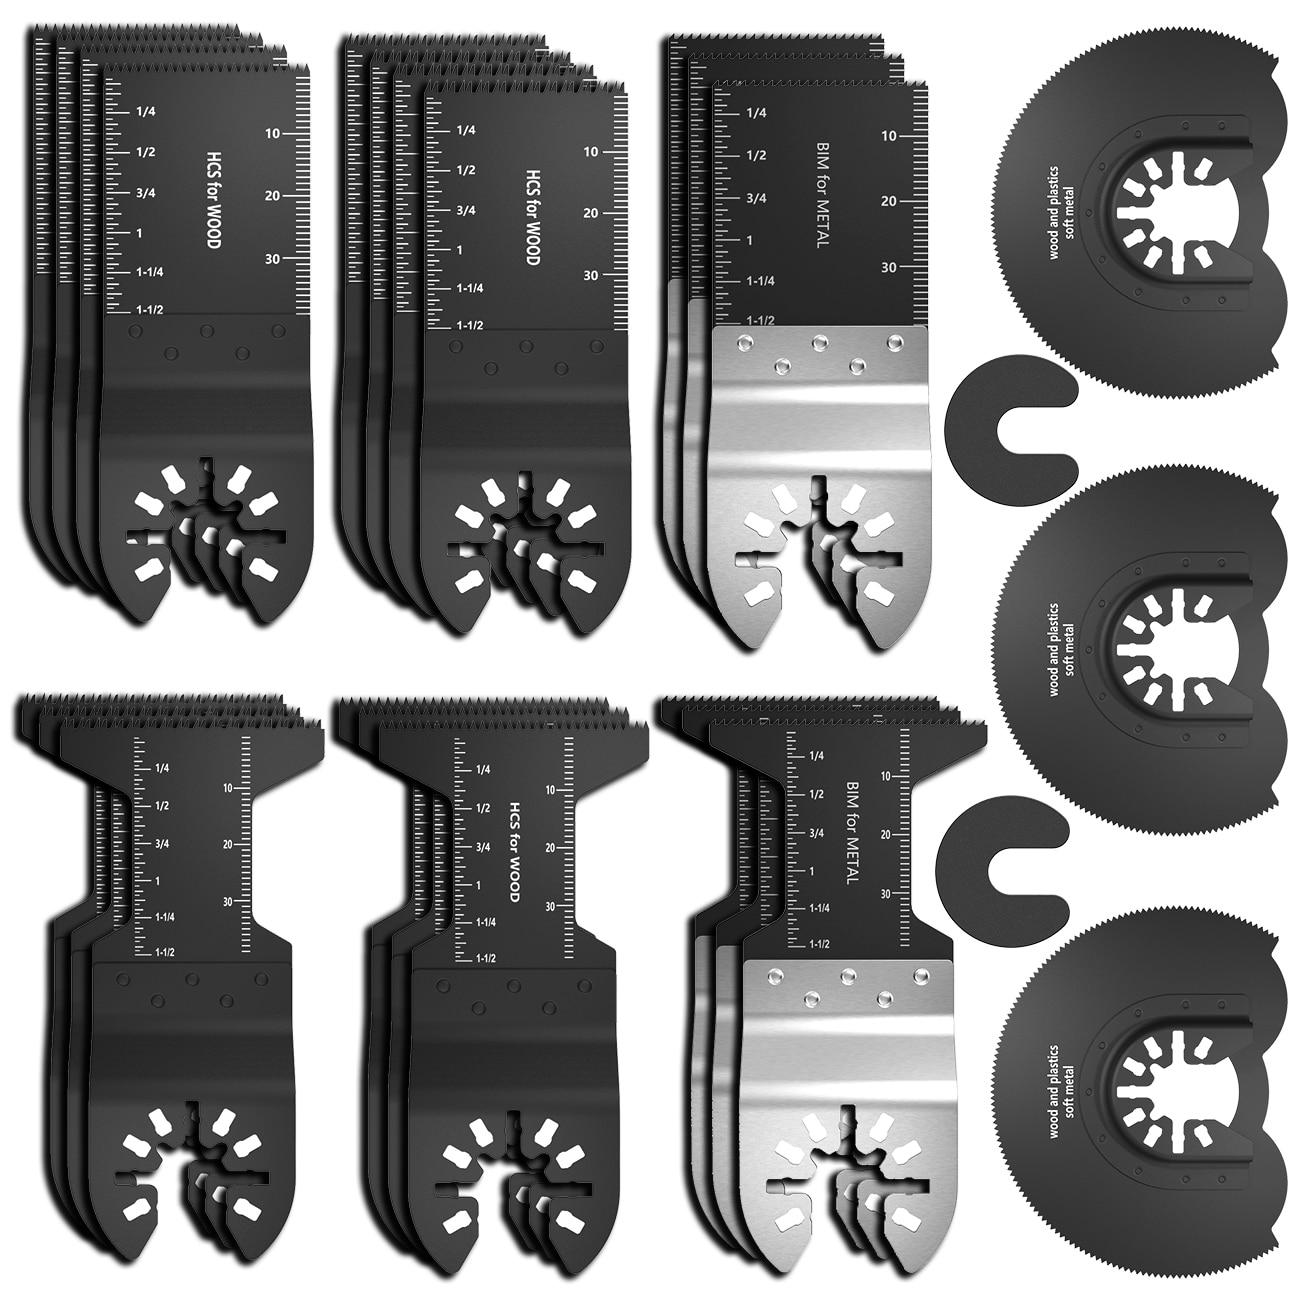 25Pcs/Set Oscillating Multi Tool Saw Blade Multi-Function Cutting Wood Tools For Renovator Power Cutting Multimaster Tools